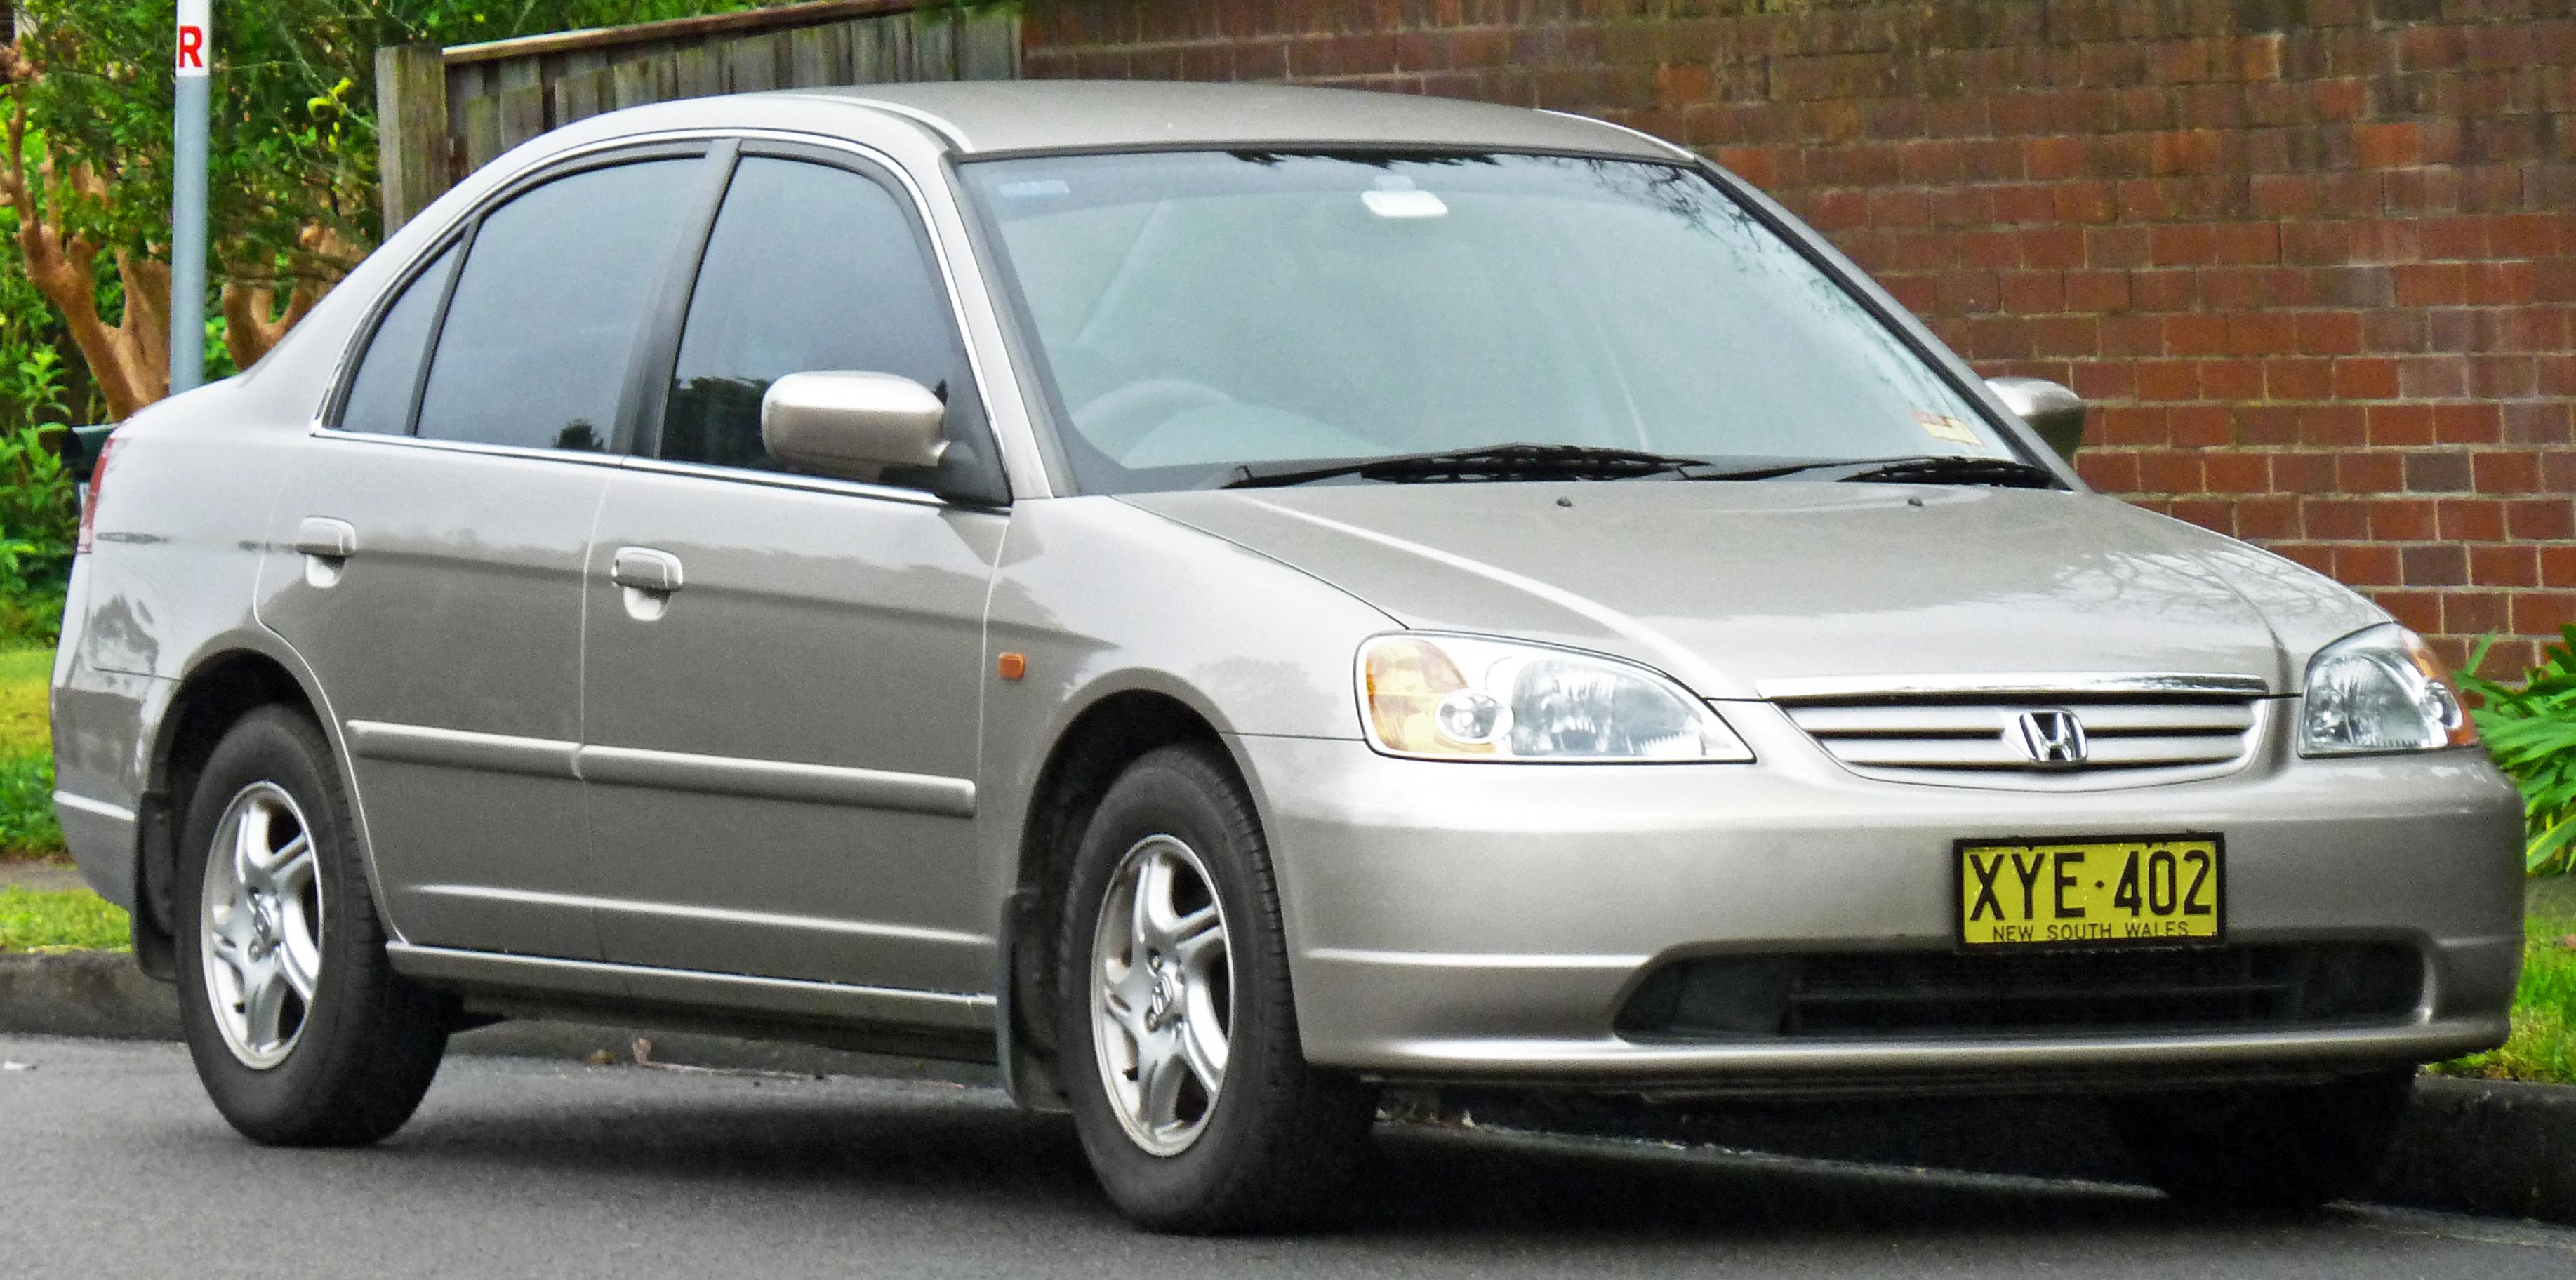 Хонда цивик 2002 фото